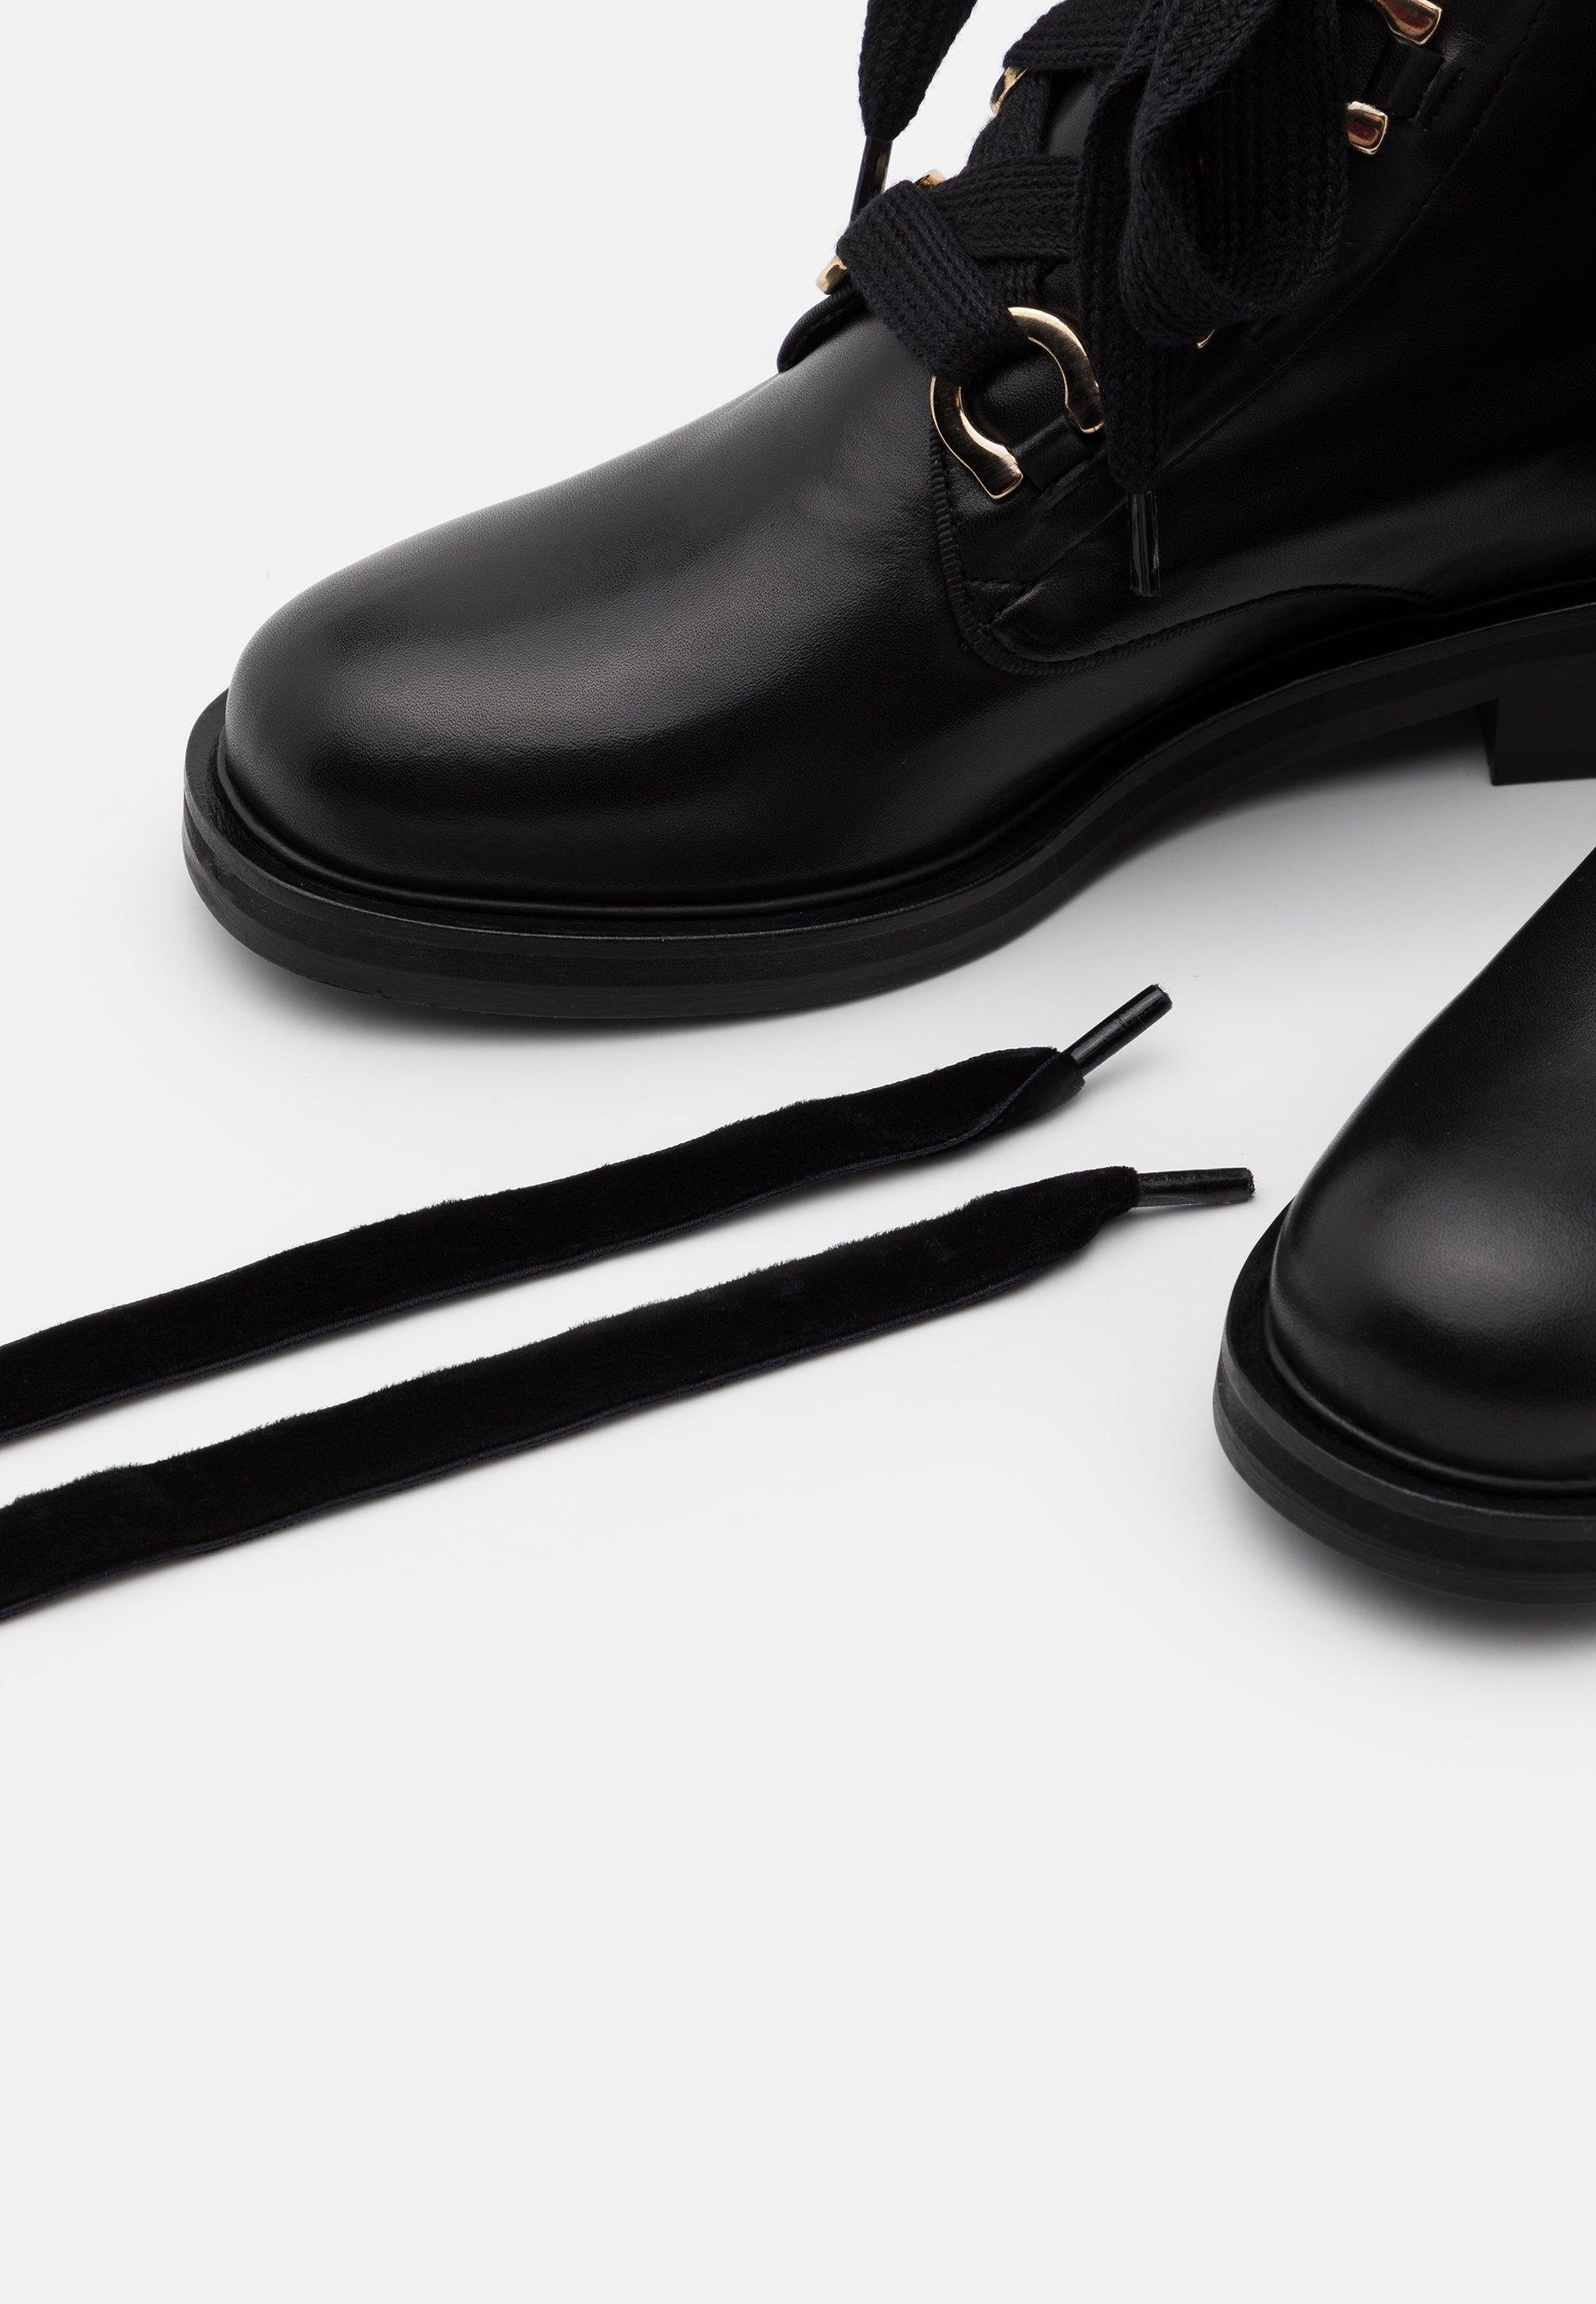 ARAMIS Ankelboots noir